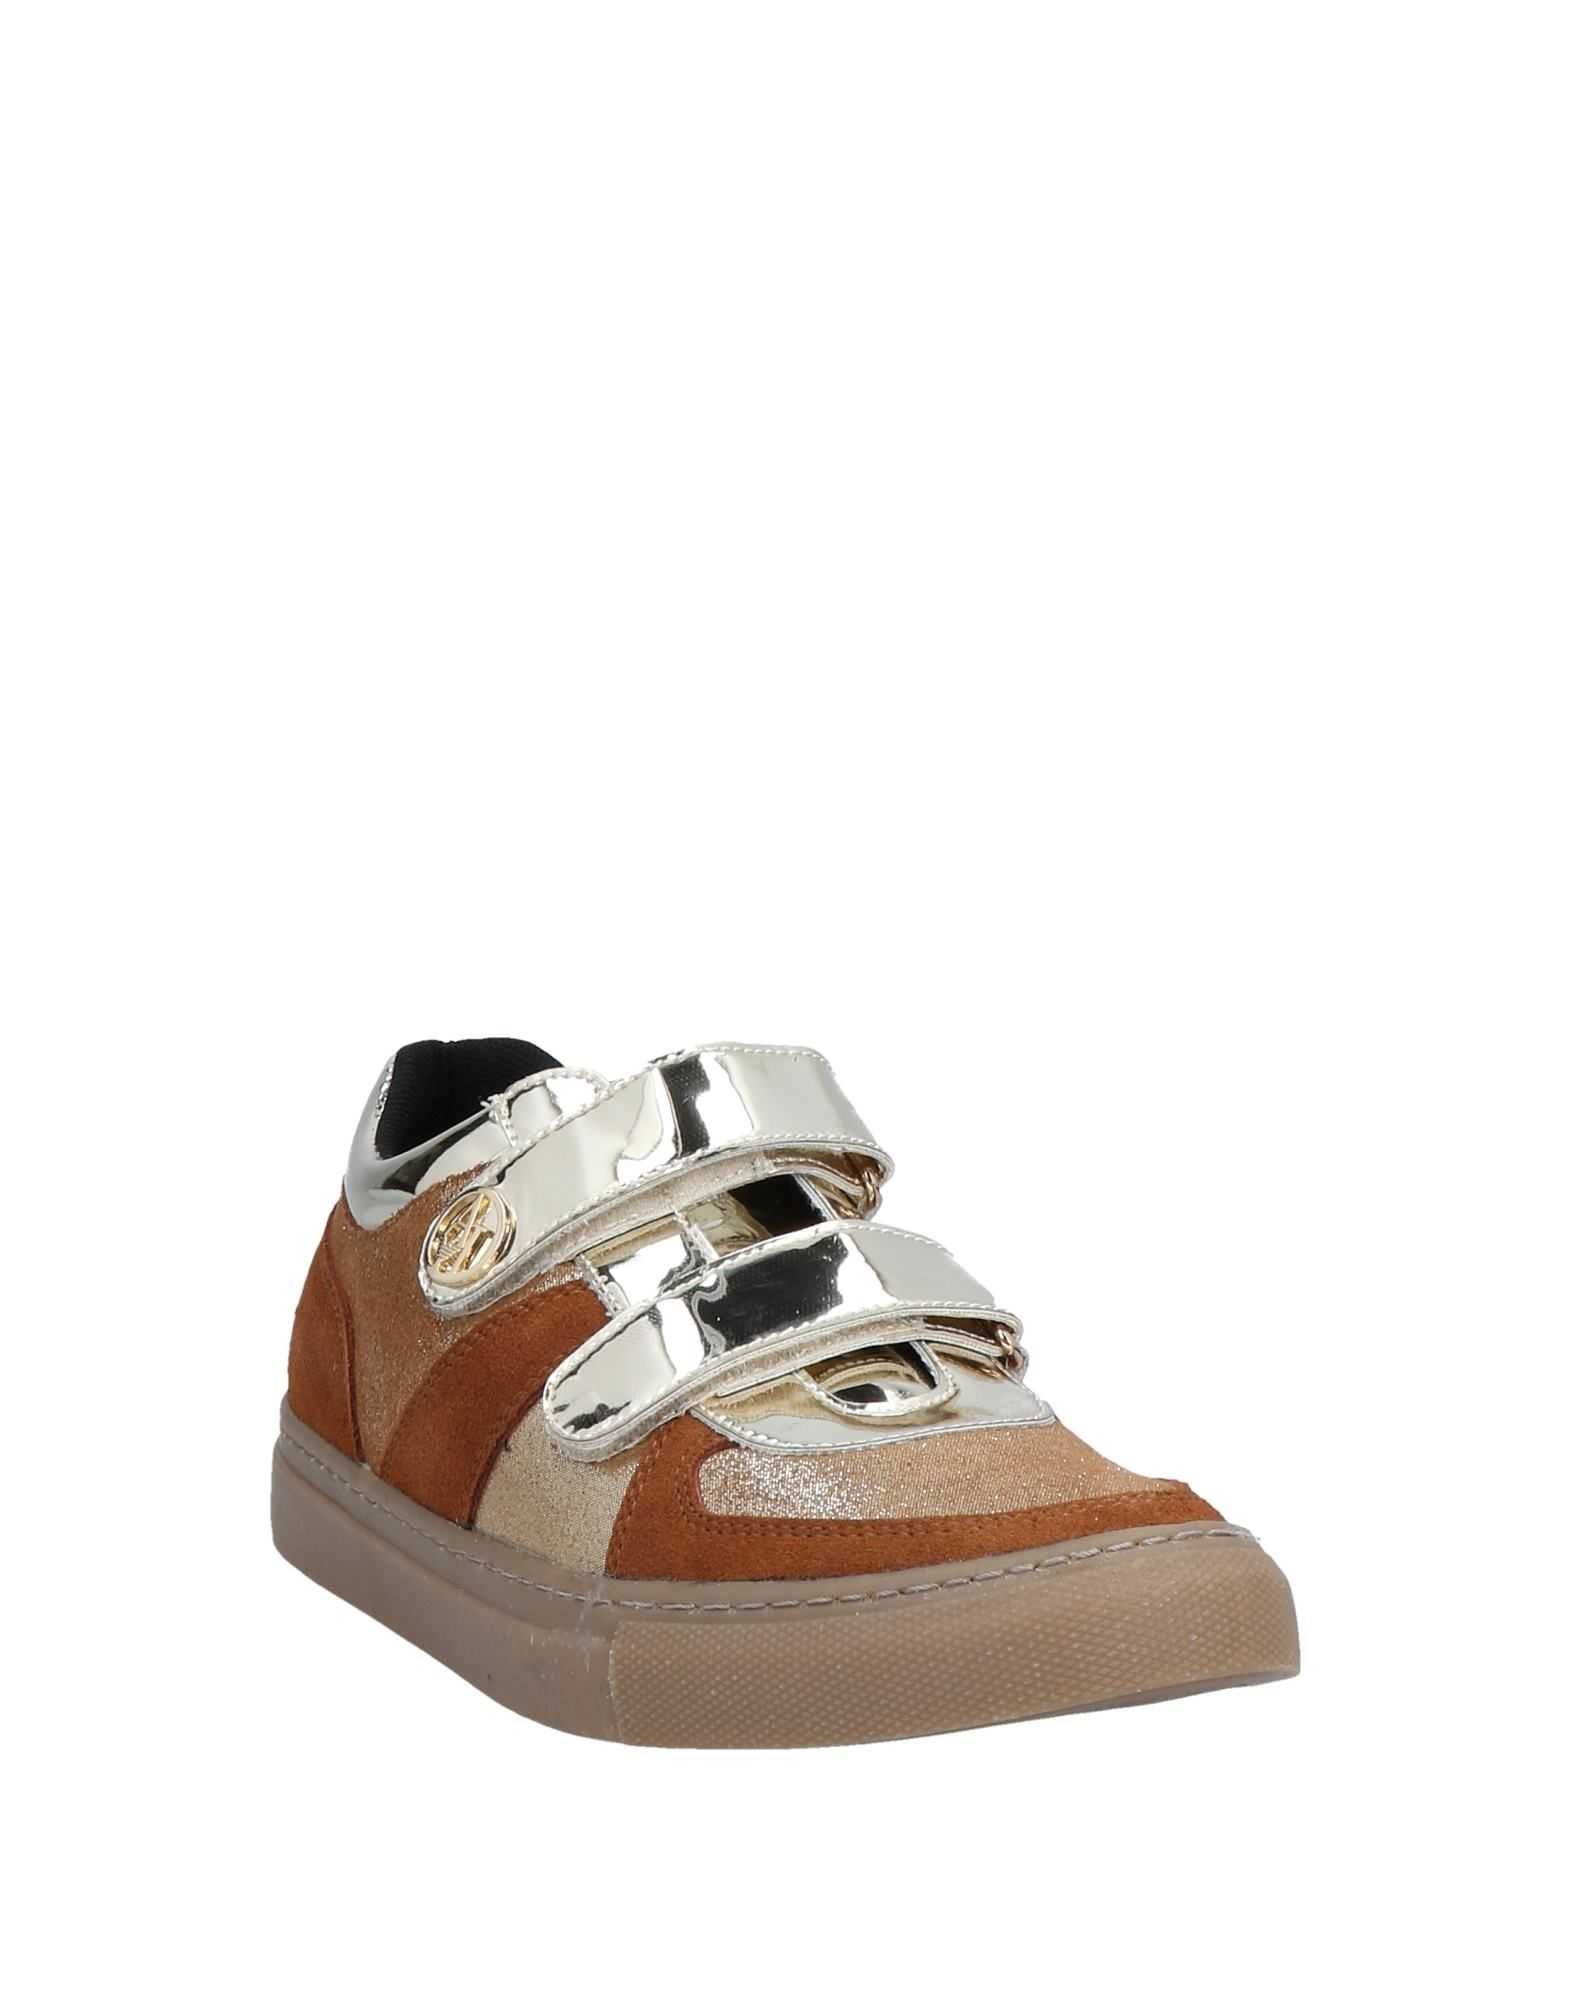 Stilvolle billige Schuhe Armani Jeans 11580957PD Turnschuhes Damen 11580957PD Jeans 88b283